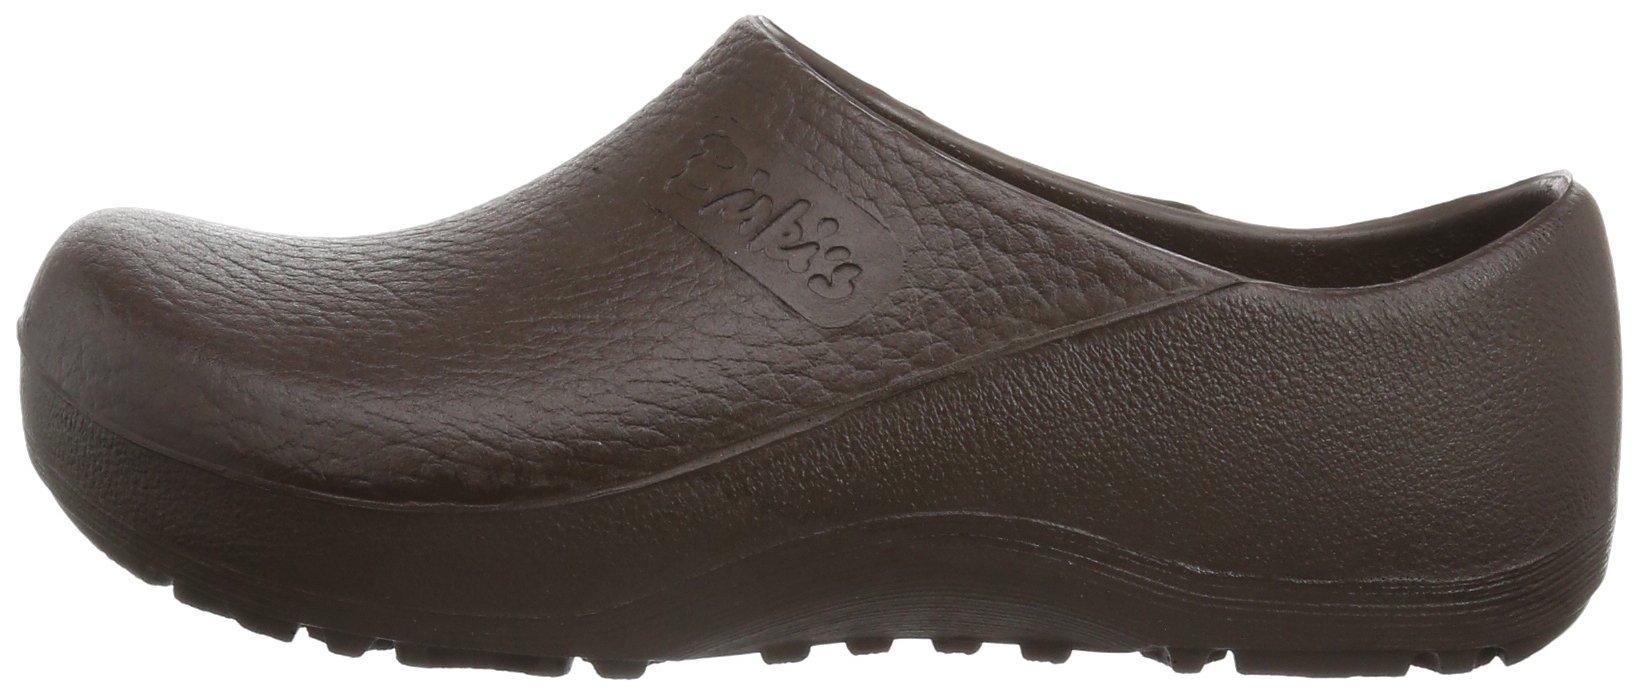 Birkenstock Men´s Profi-Birki Brown Alpro-Foam Sandals 40 EU (M7/L9 US) R 074061 by Birkenstock (Image #5)